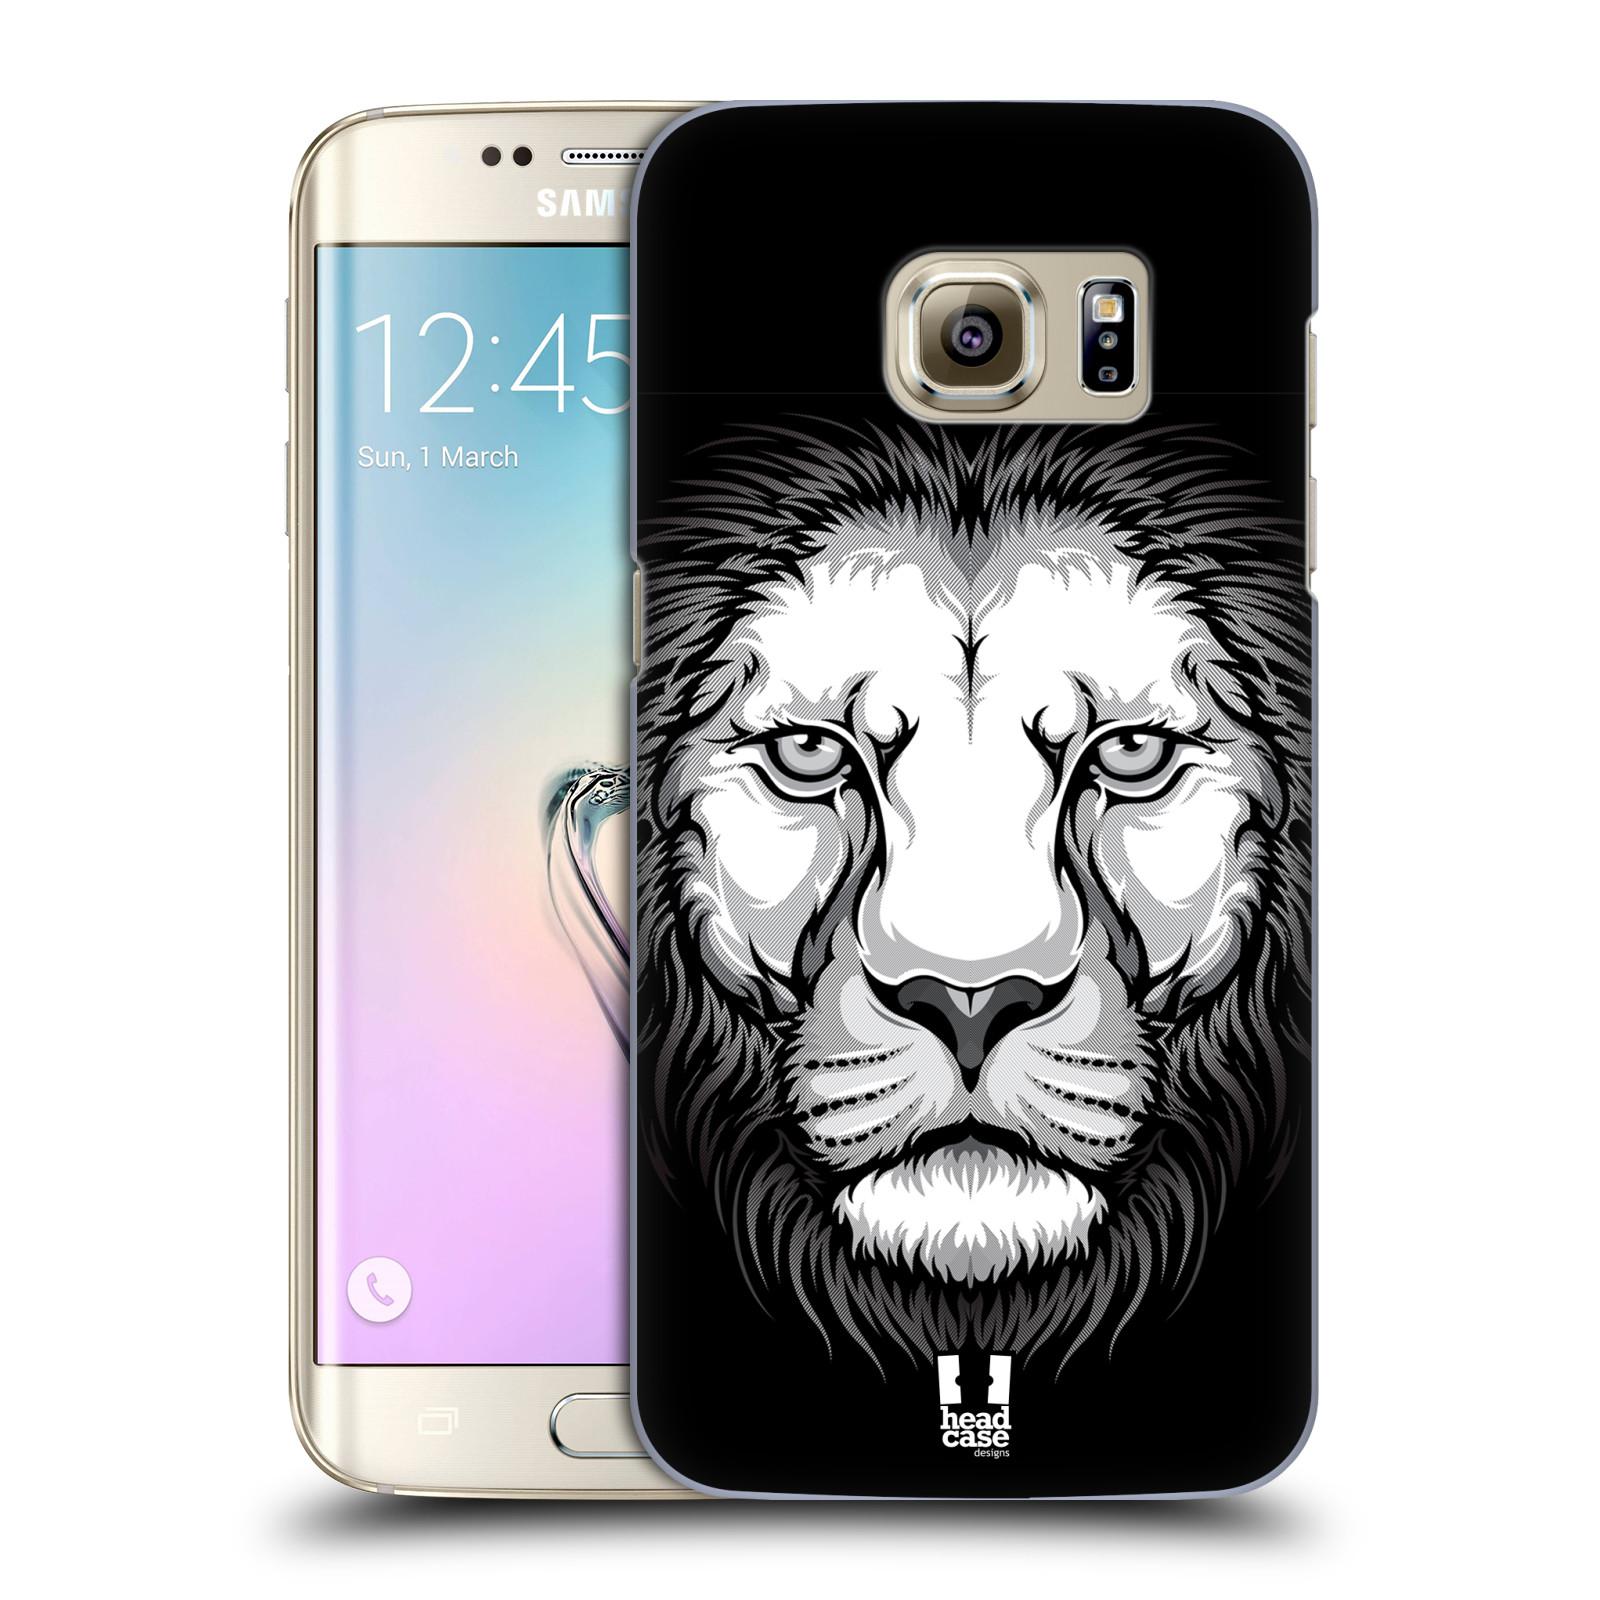 HEAD CASE plastový obal na mobil SAMSUNG GALAXY S7 EDGE vzor Zvíře kreslená tvář lev